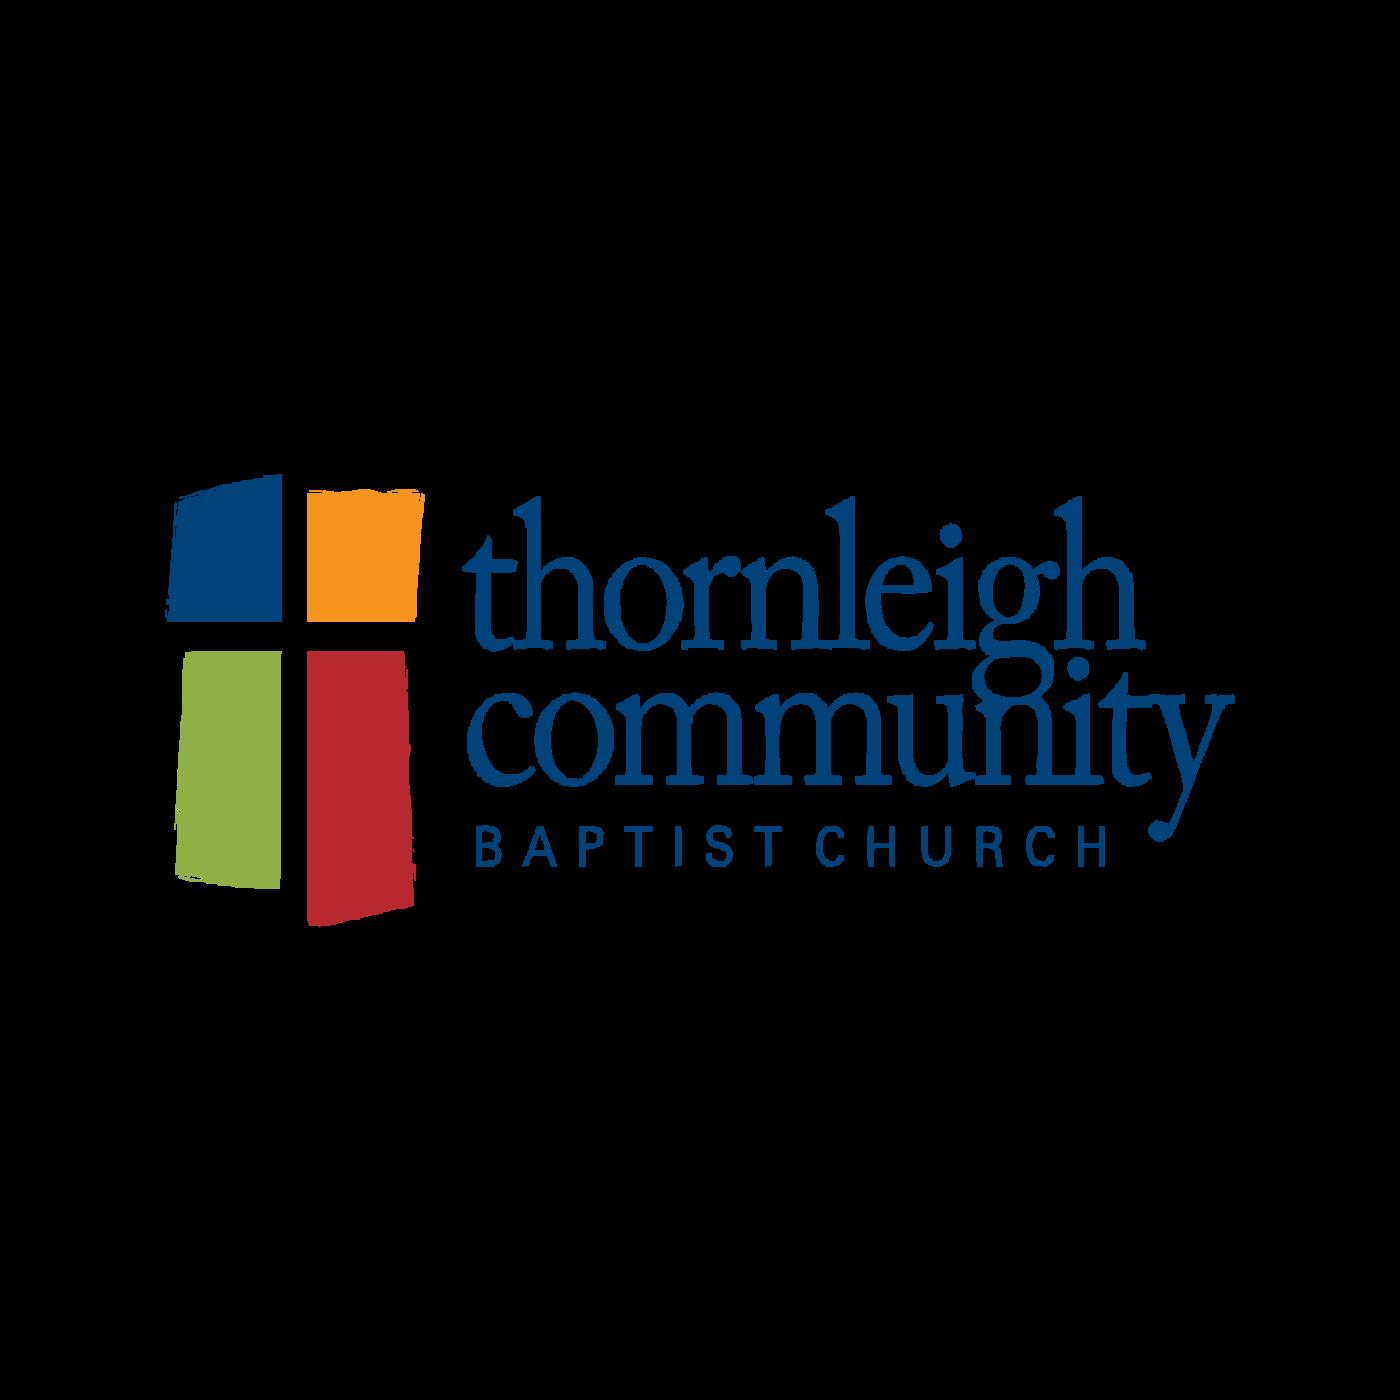 Thornleigh Community Baptist Church